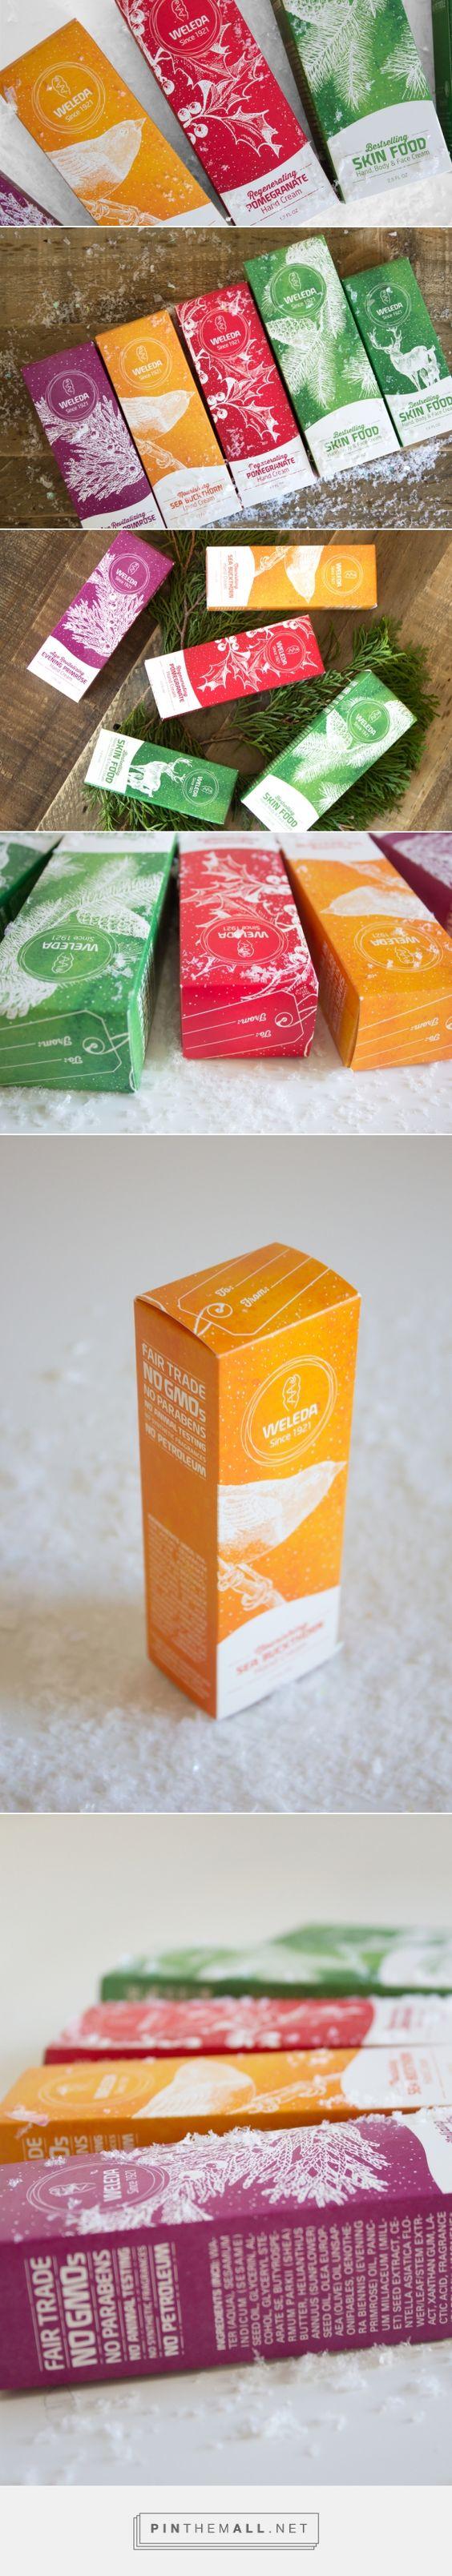 Weleda North America Holiday Packaging /  BRIGADE